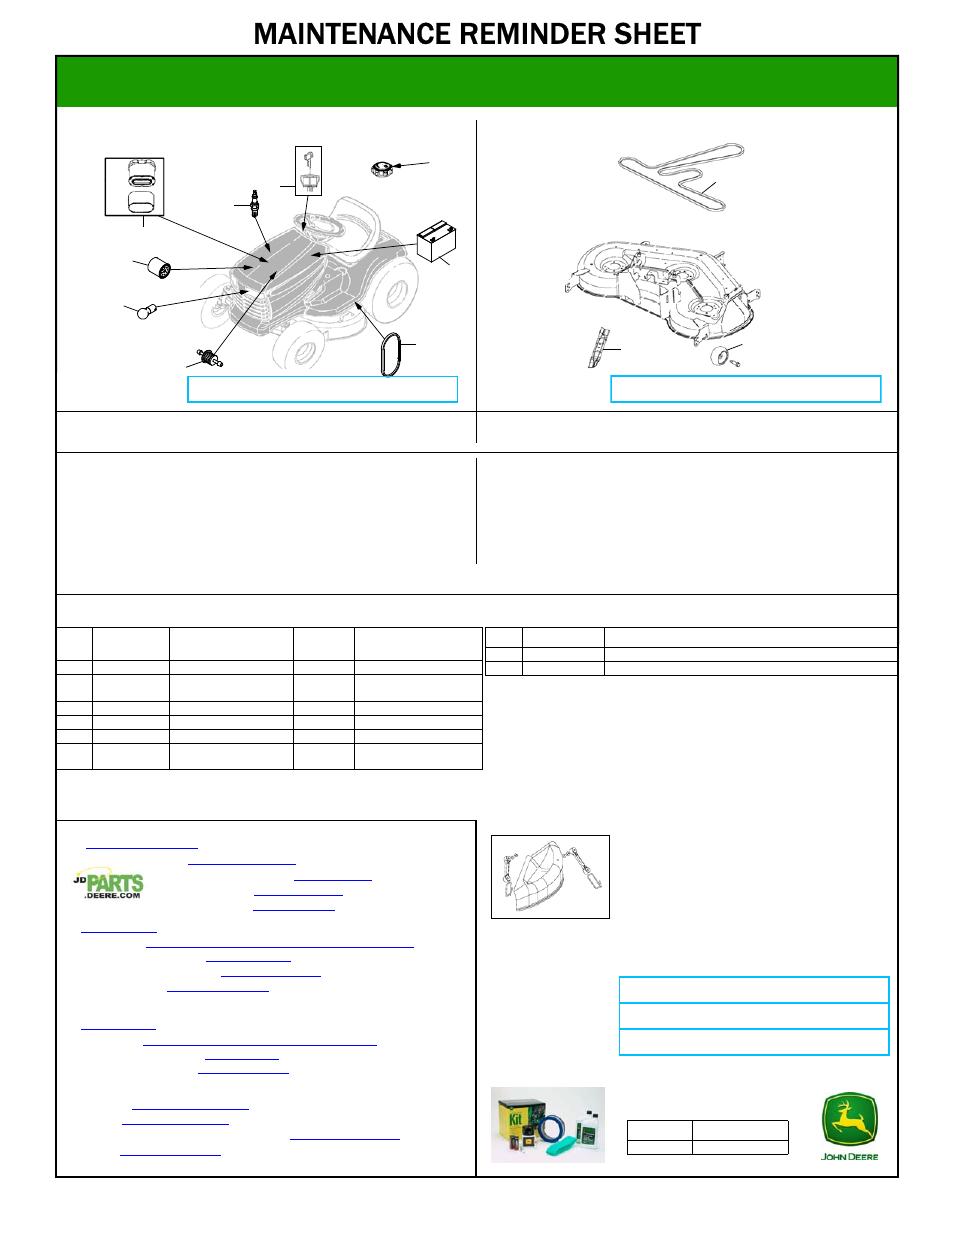 John Deere La145 User Manual 1 Page Also For La175